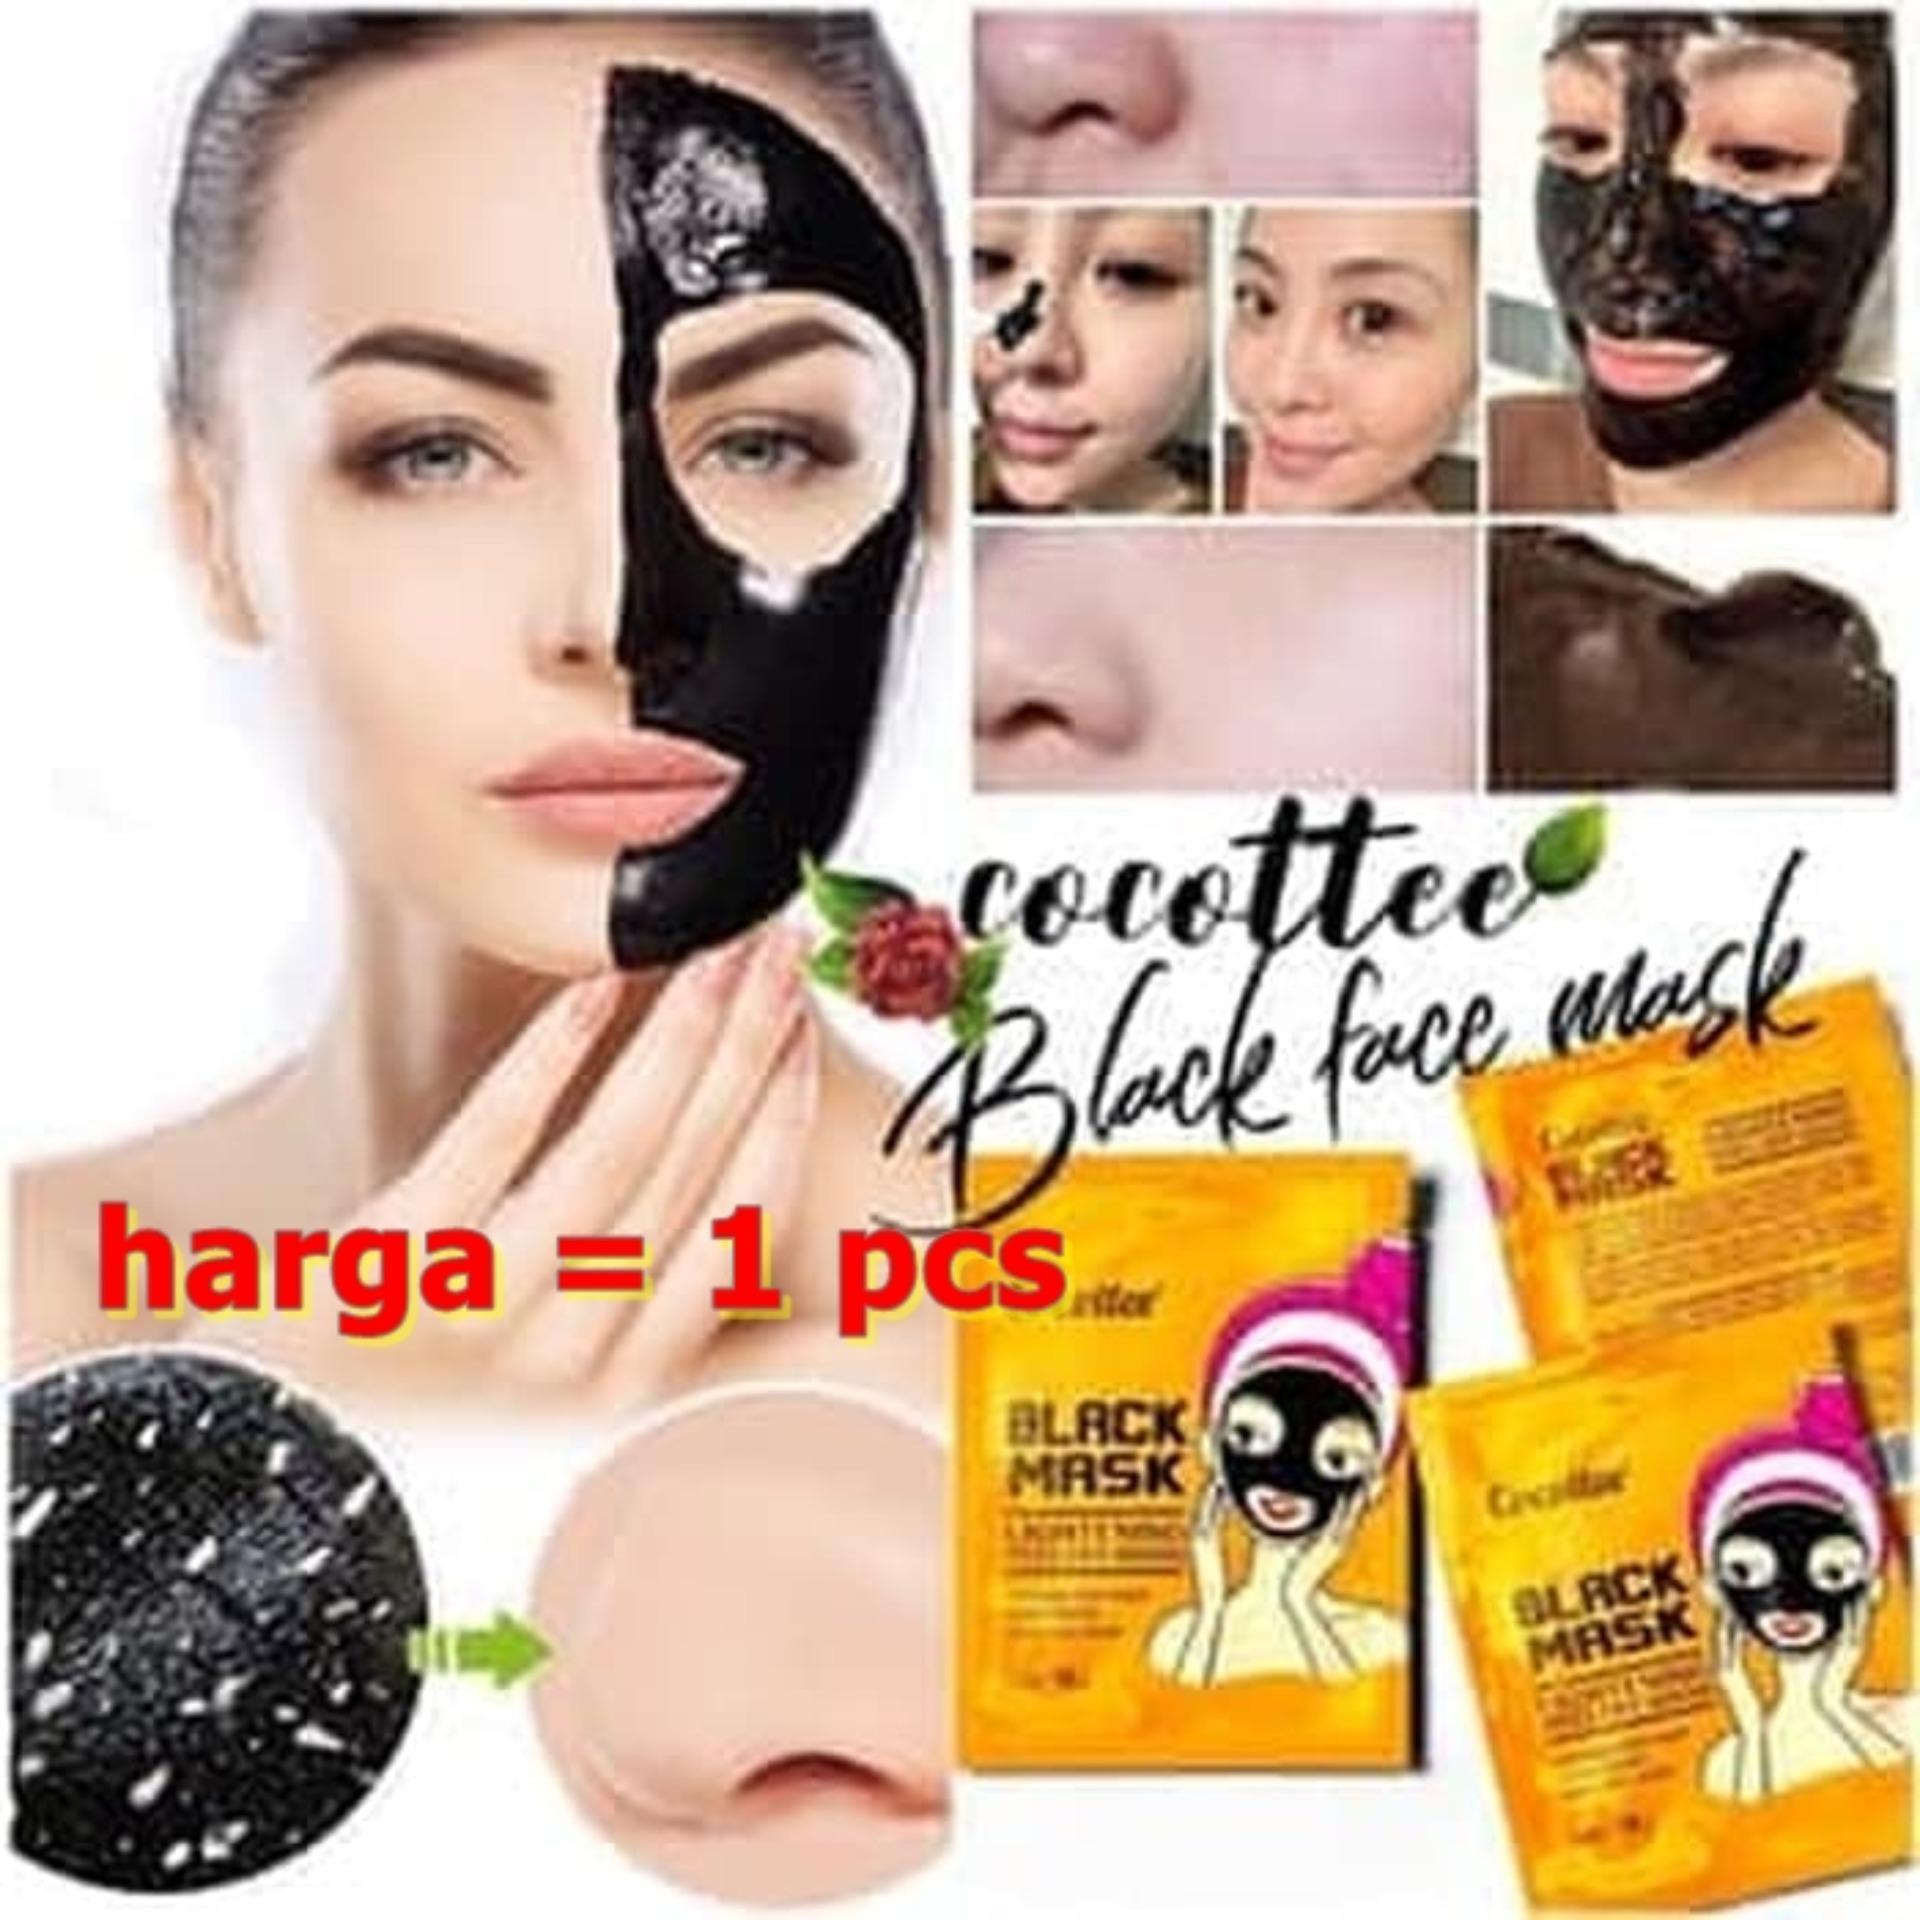 Buy Sell Cheapest Masker Mud Mask Best Quality Product Deals Hanasui 10pcs Lumpur Hitam Naturgo No Box Komedo Shiseido Kpw 158 Cocotee Black Face Brightening Peel Off Wajah